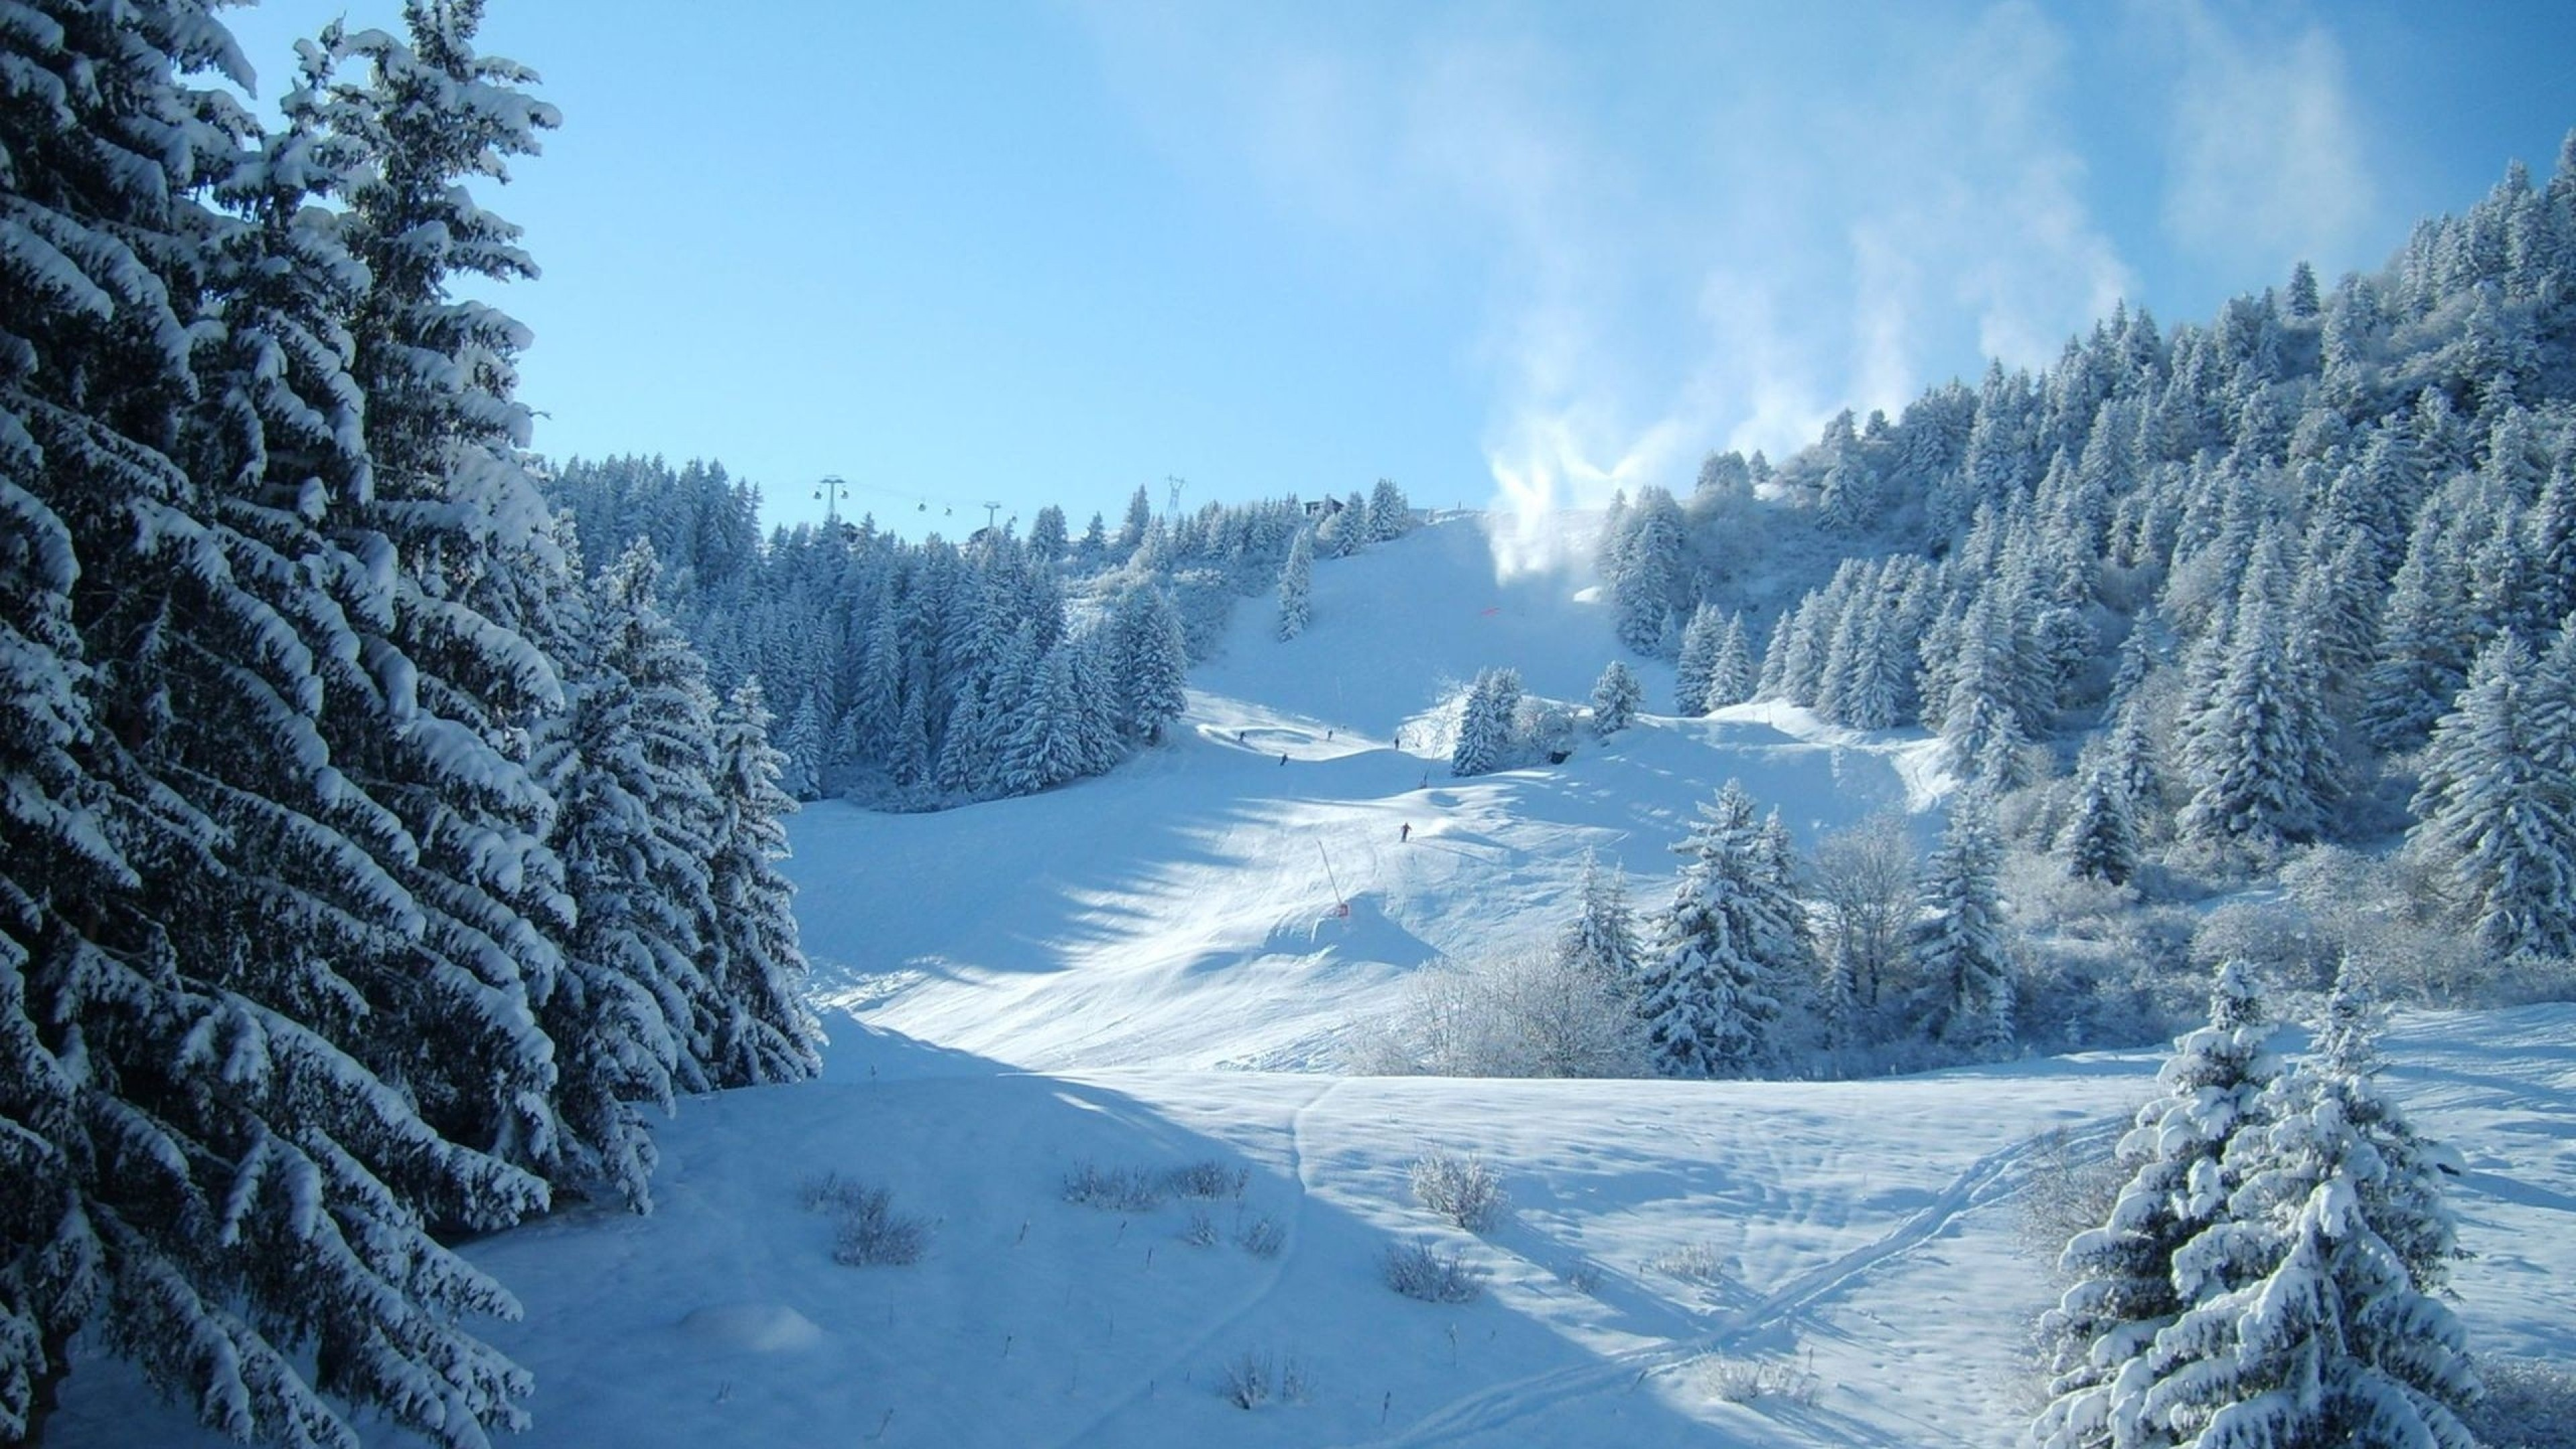 Wallpaper mountains, snow, winter